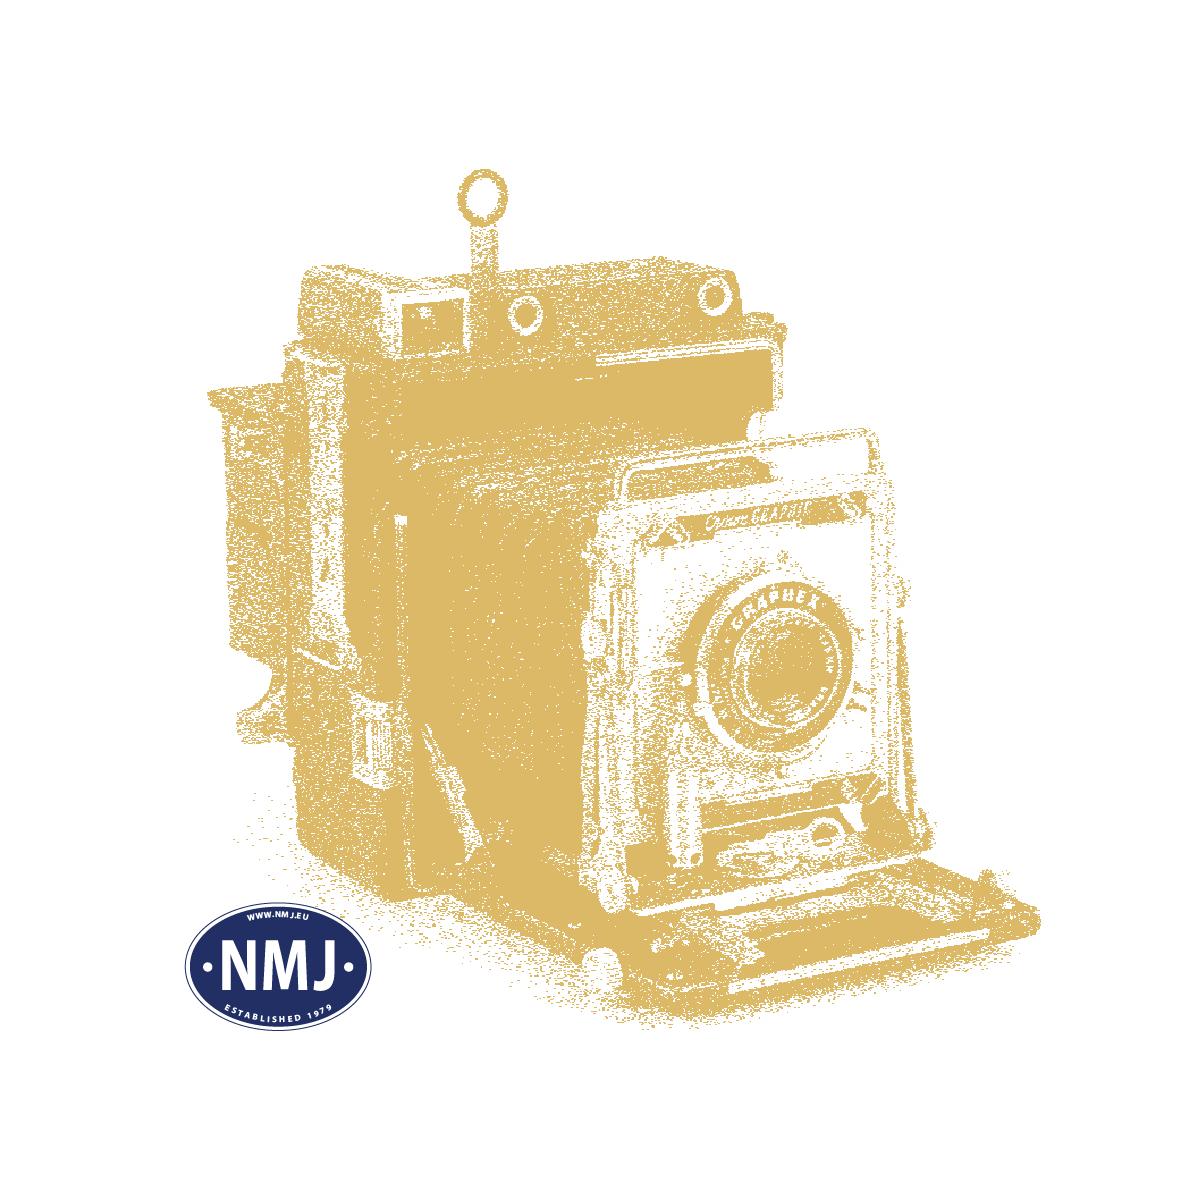 NMJT84.301 - NMJ Topline NSB BM69A.11, DCC m/ Lyd